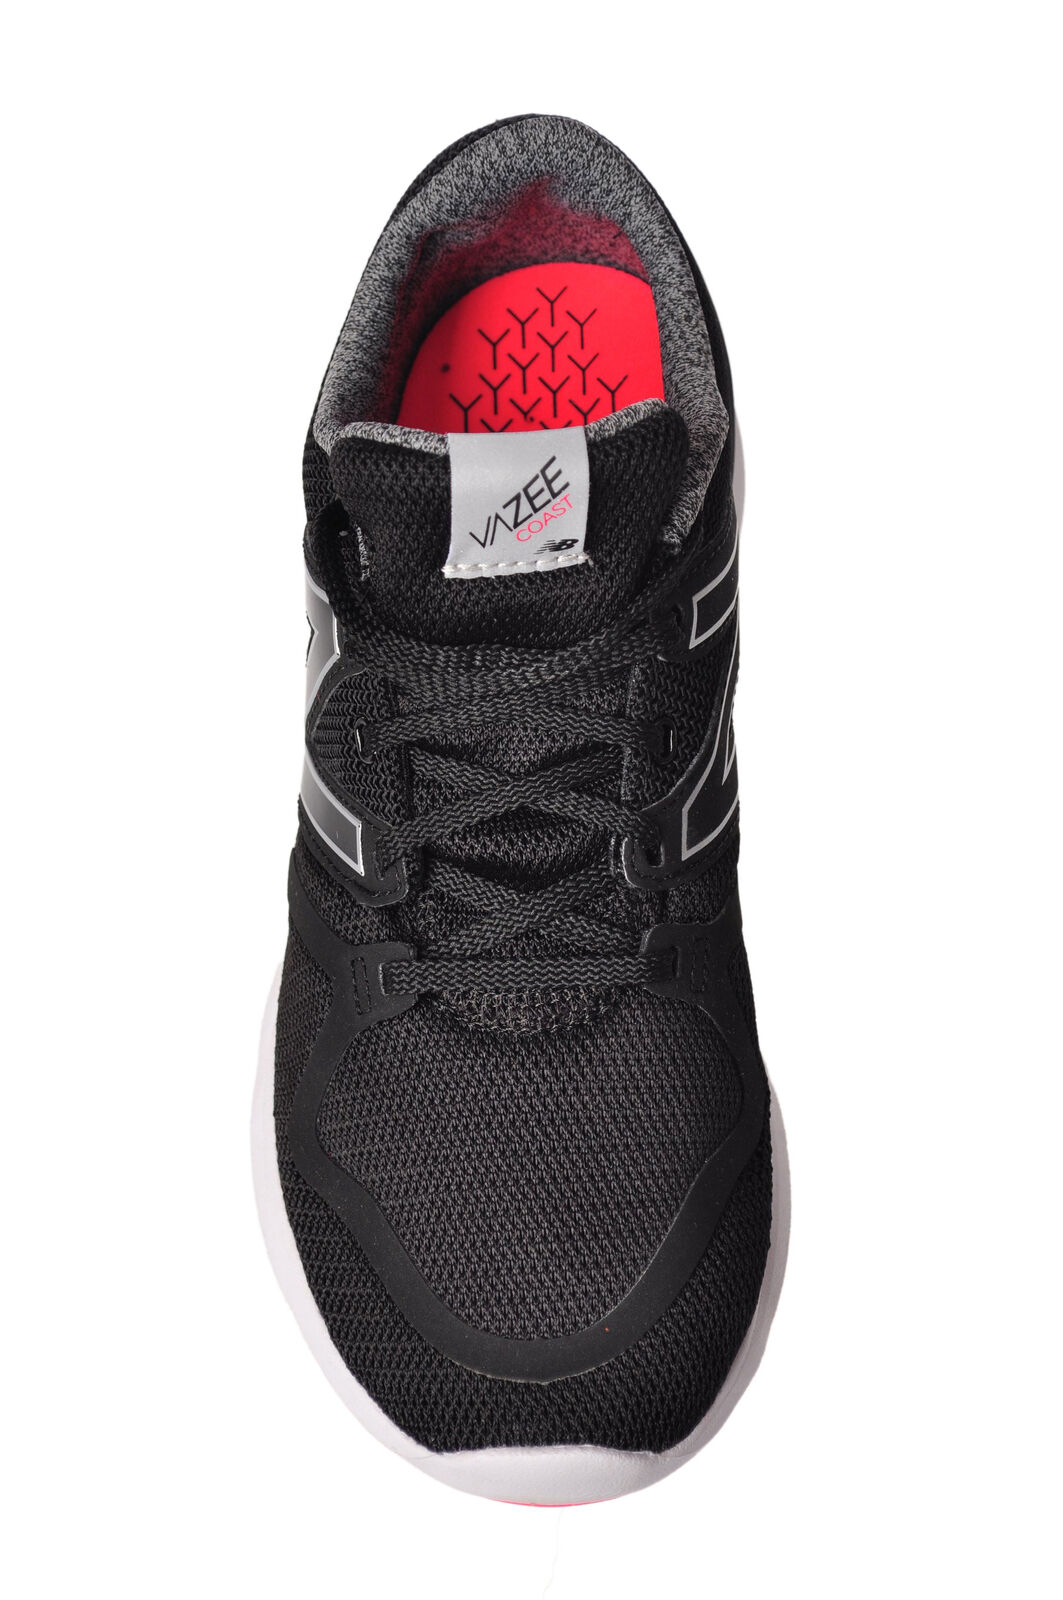 New Balance - Schuhe-Sneaker-niedrige 455715C184746 - Frau - Schwarz - 455715C184746 Schuhe-Sneaker-niedrige 4a512e